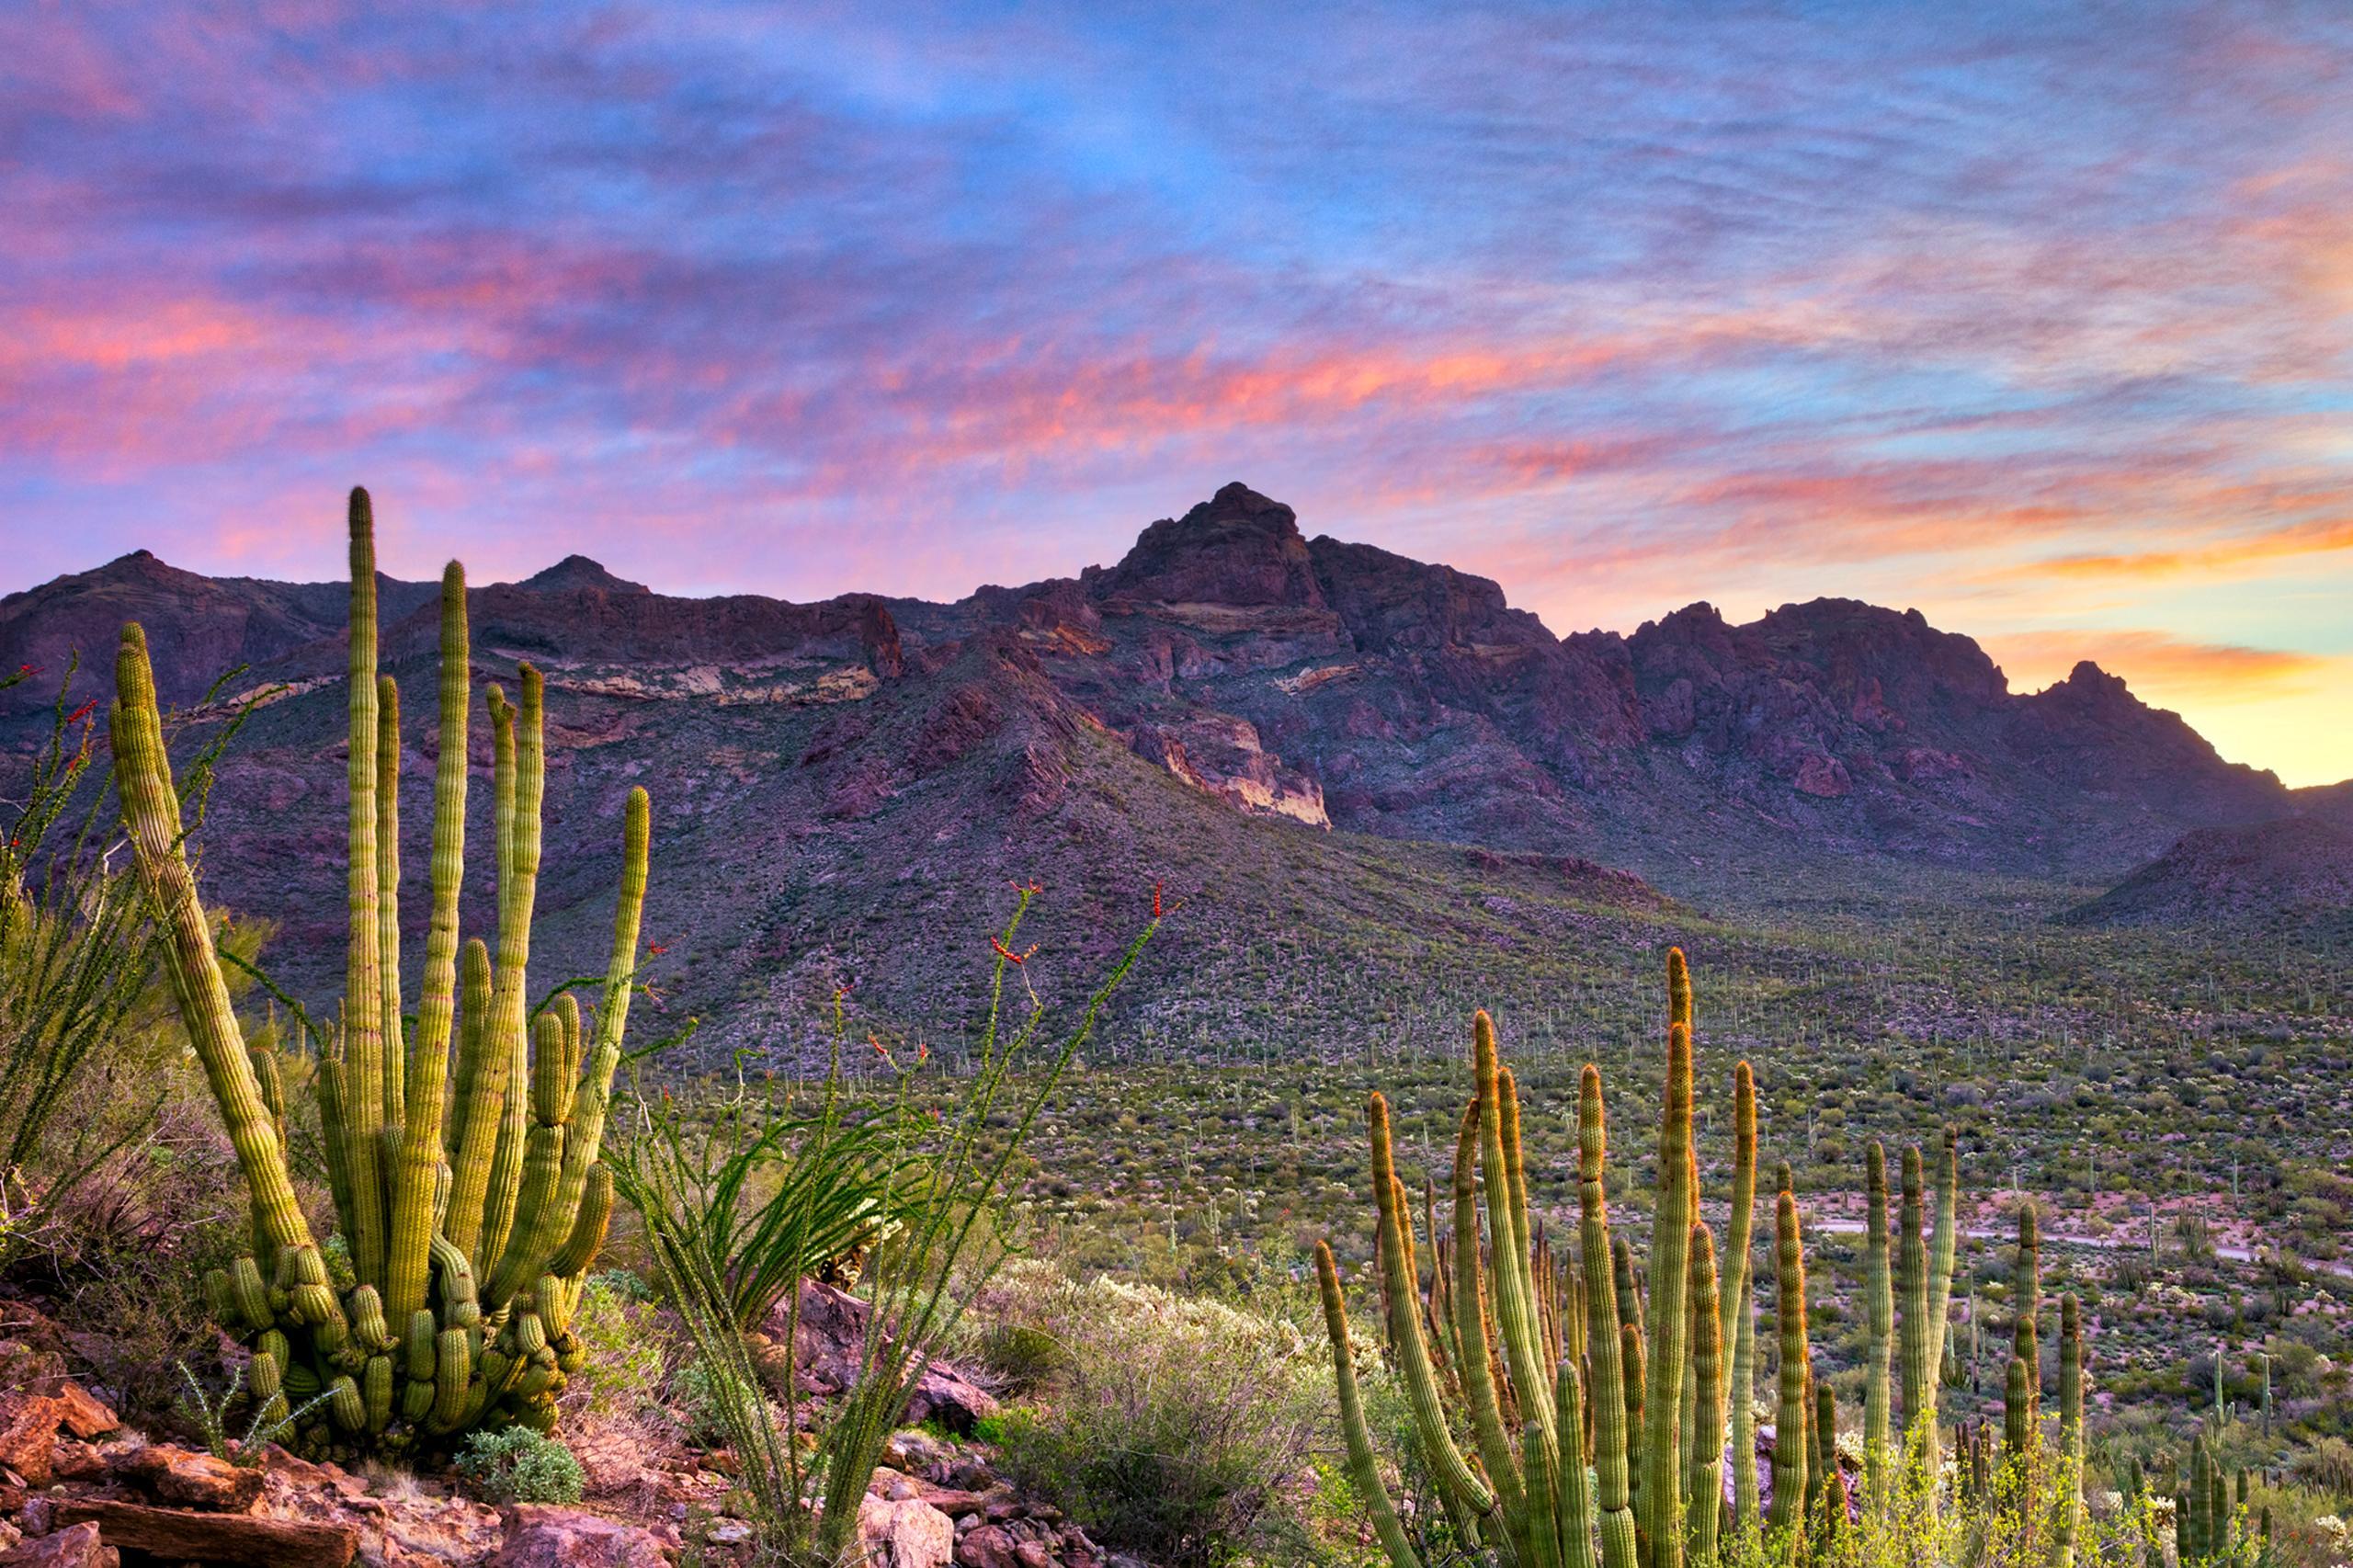 Apartments in Buckeye Arizona | Buckeye Apartments for Rent